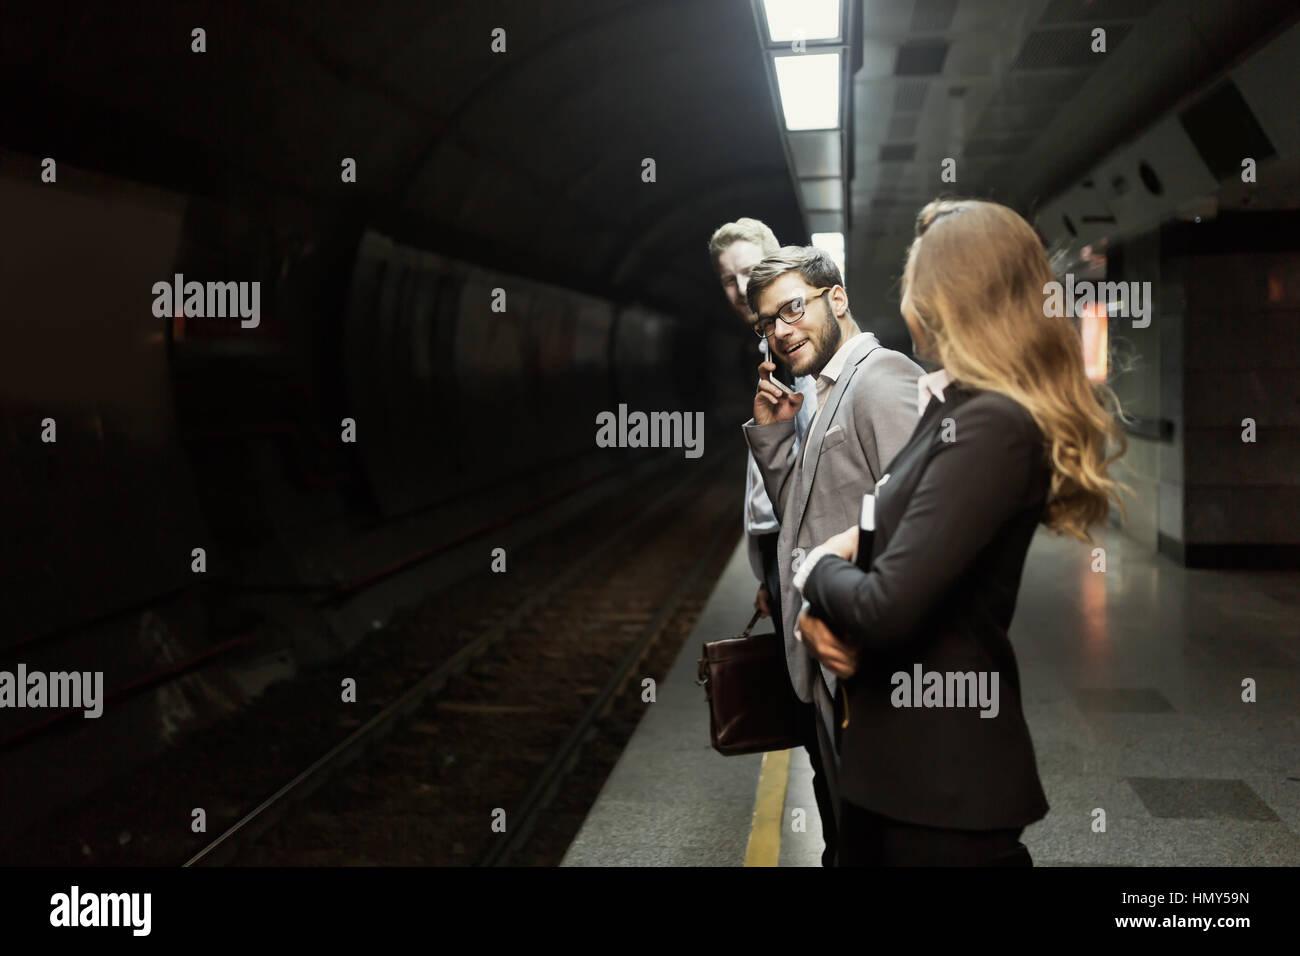 Business people waiting for transportation underground - Stock Image